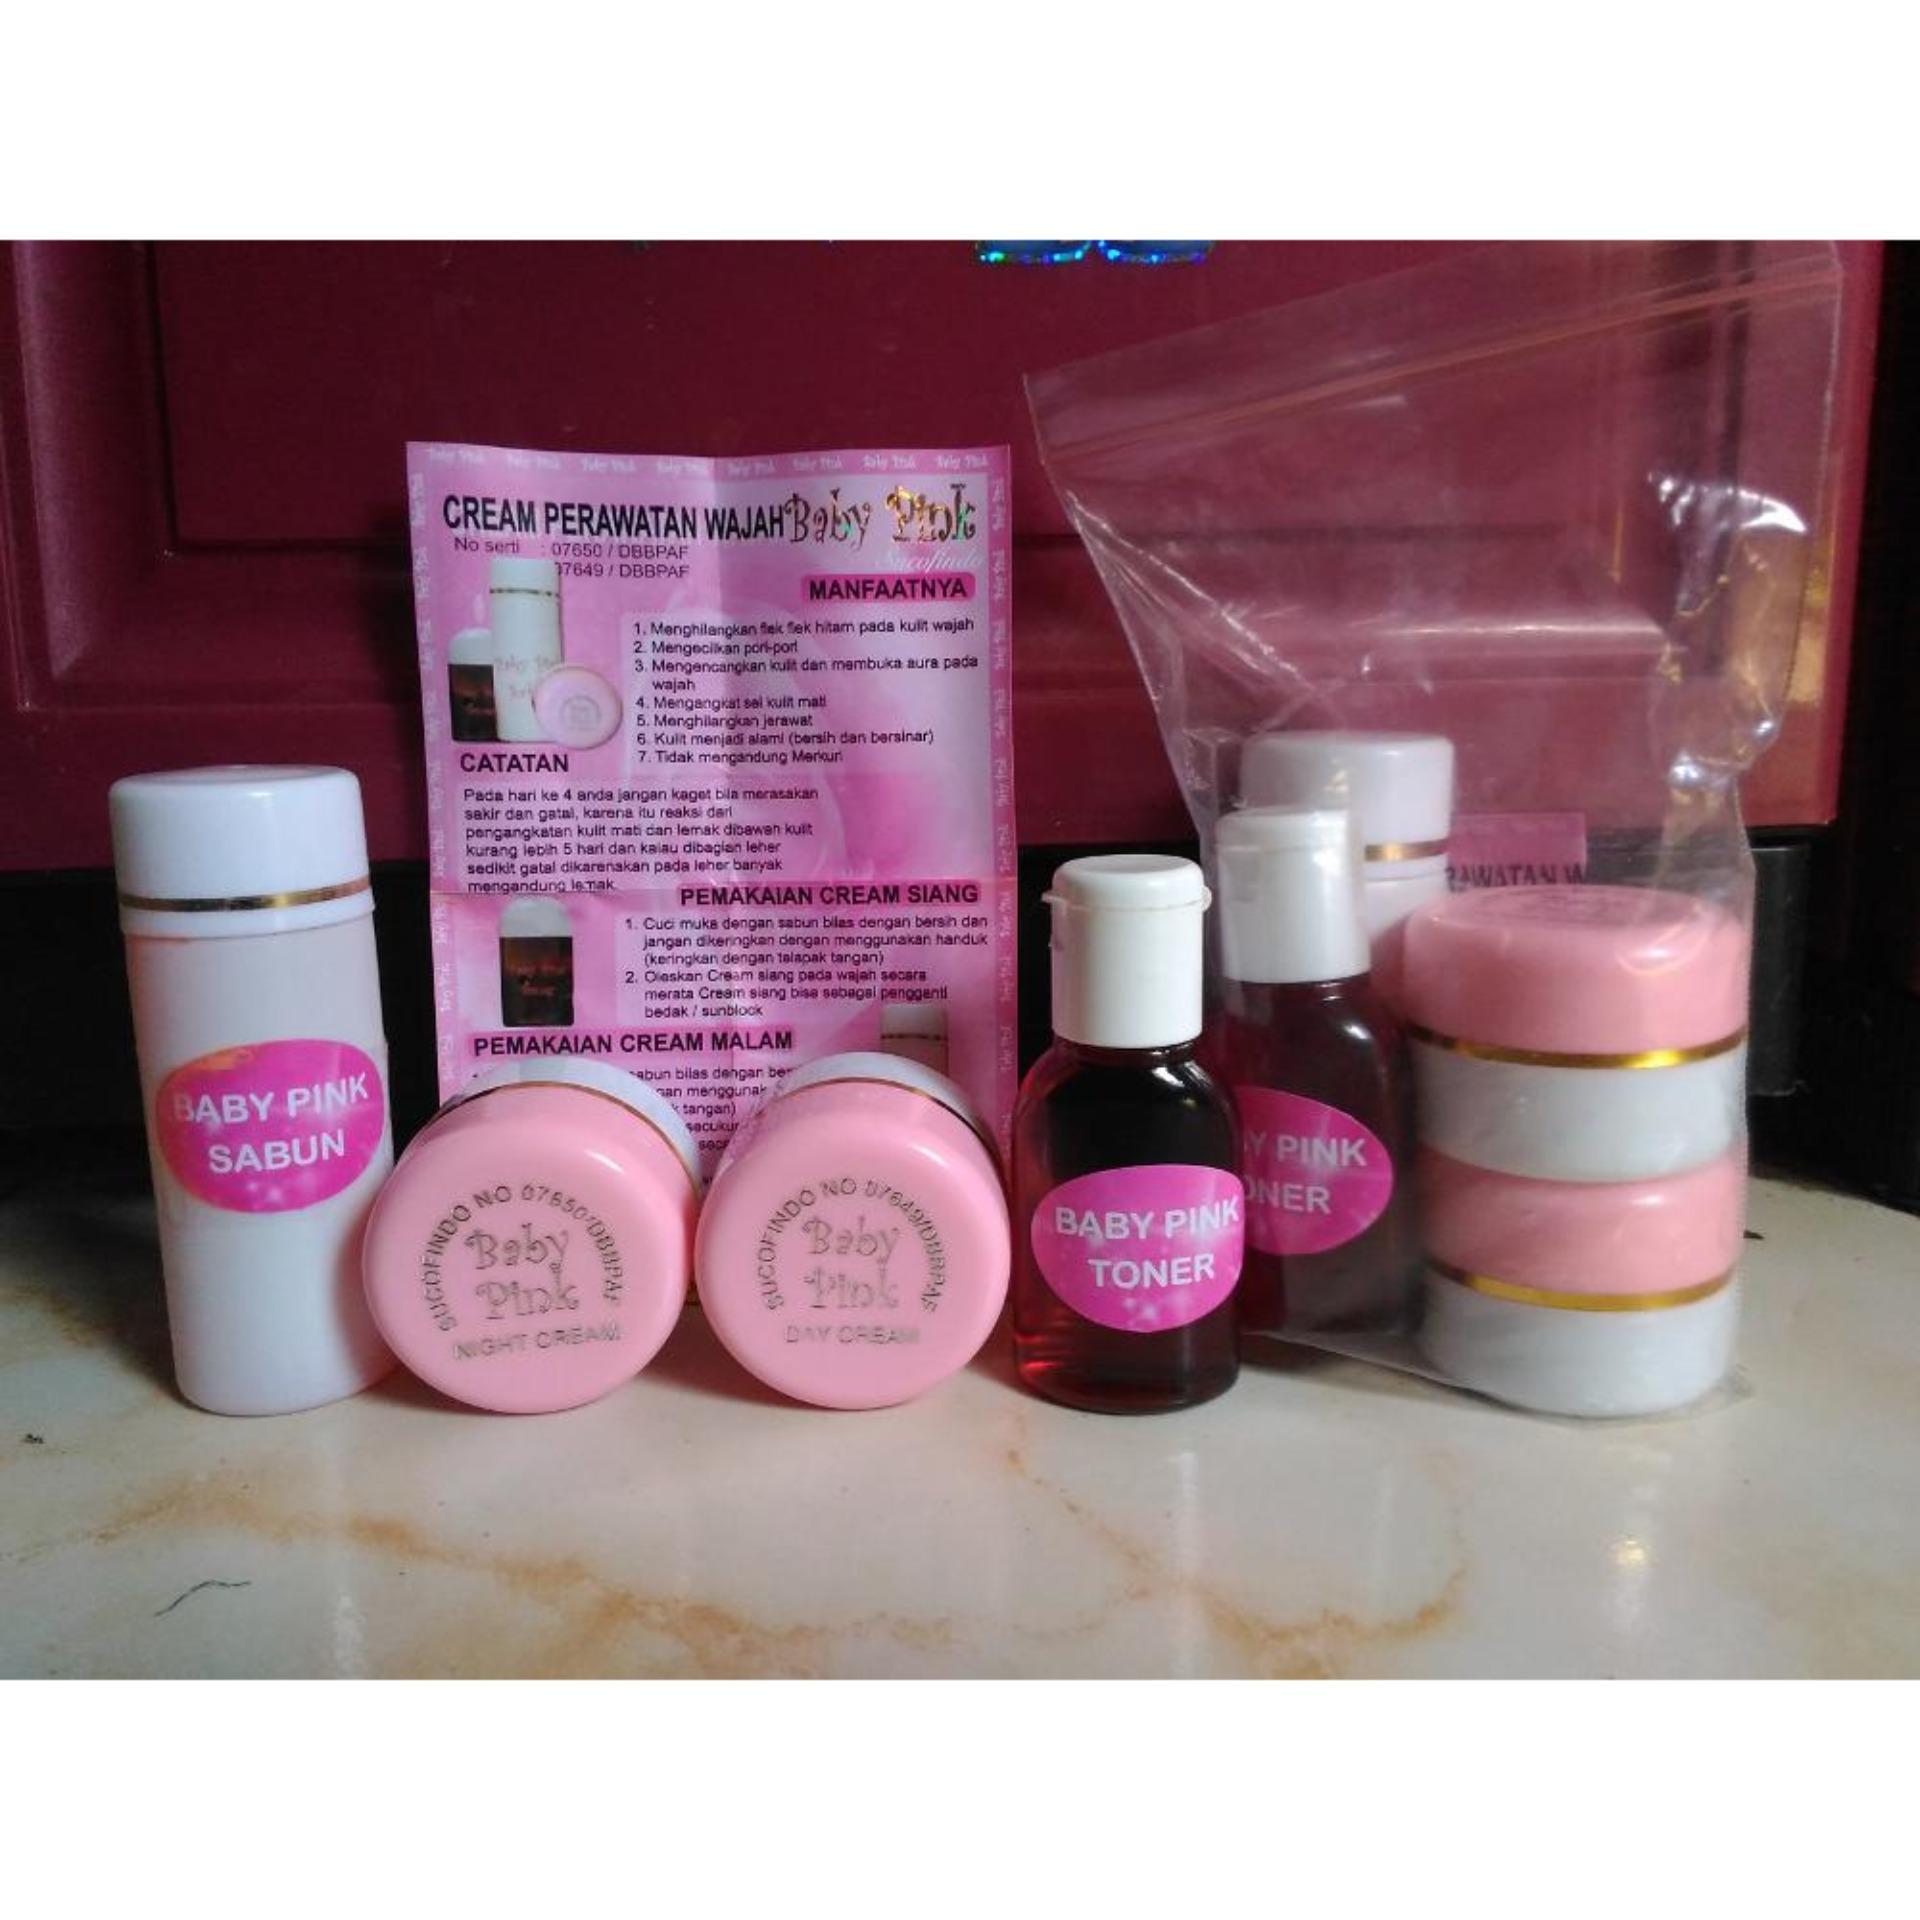 Original Cream Bd Baby Pink Bandung 1 Paket Daftar Harga Terkini Babypink Sucofindo Emboss 15gr Plus Sertifikat Berhologram Source Asli 12